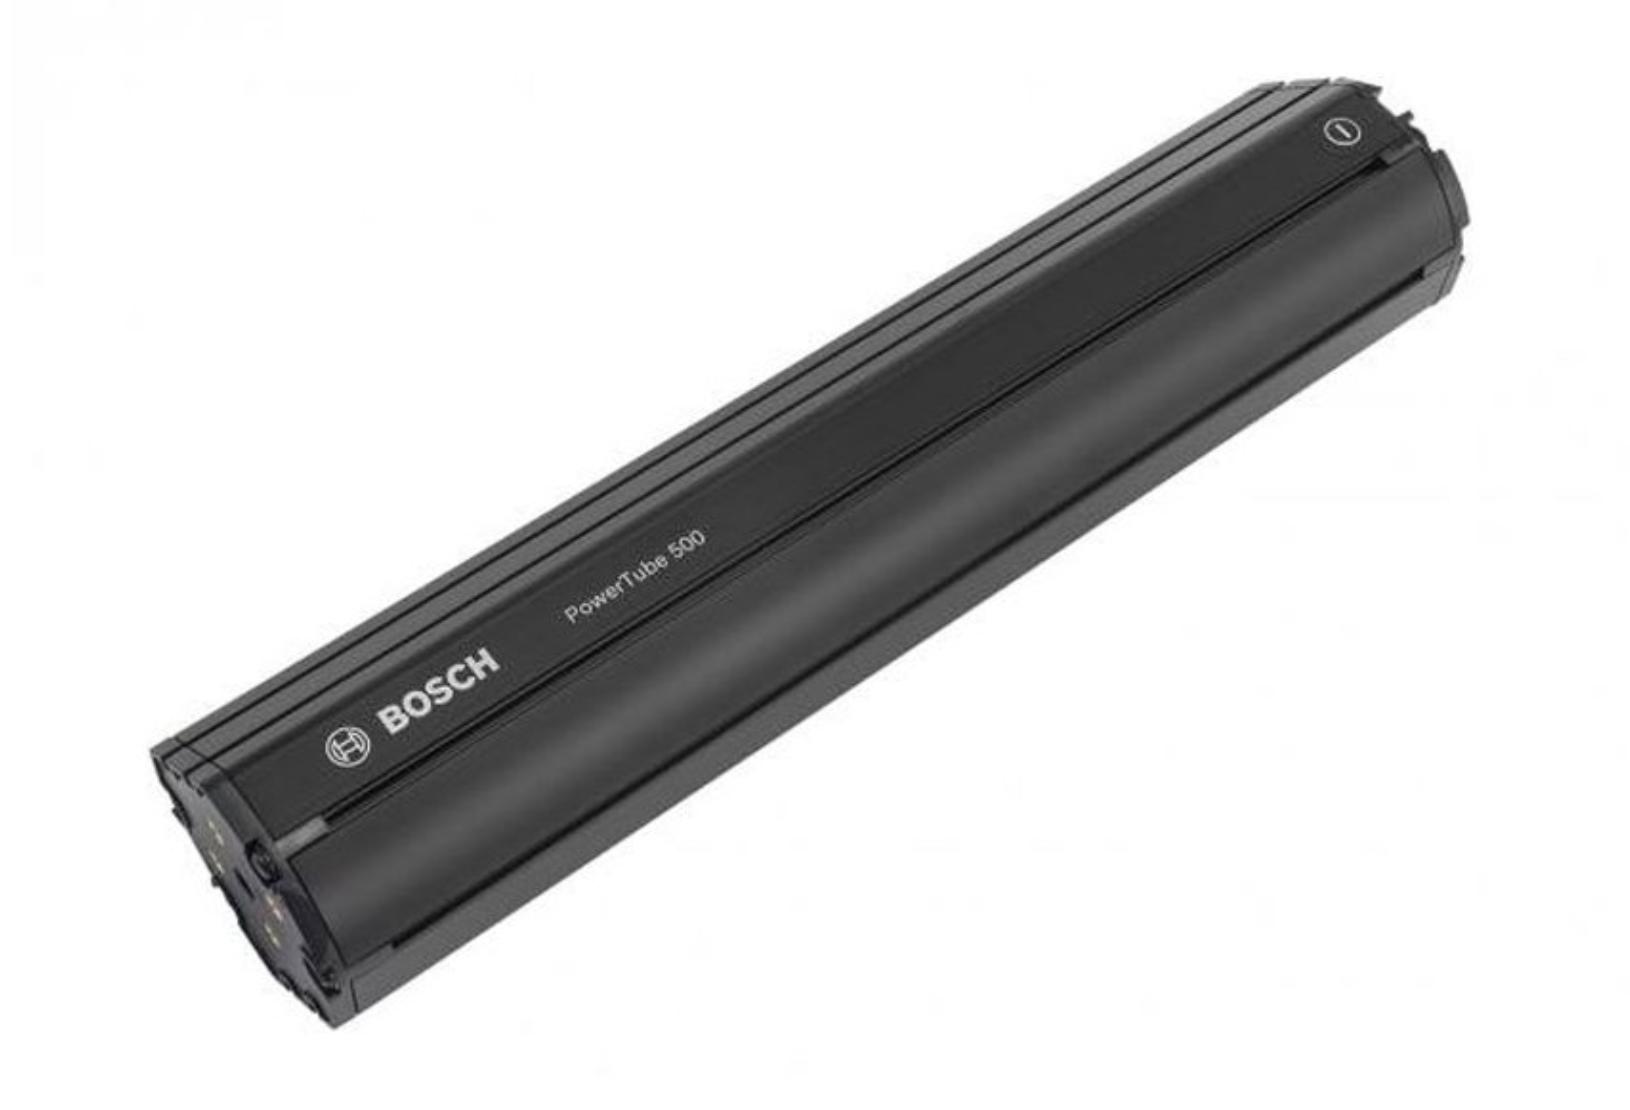 Bosch PowerTube 500